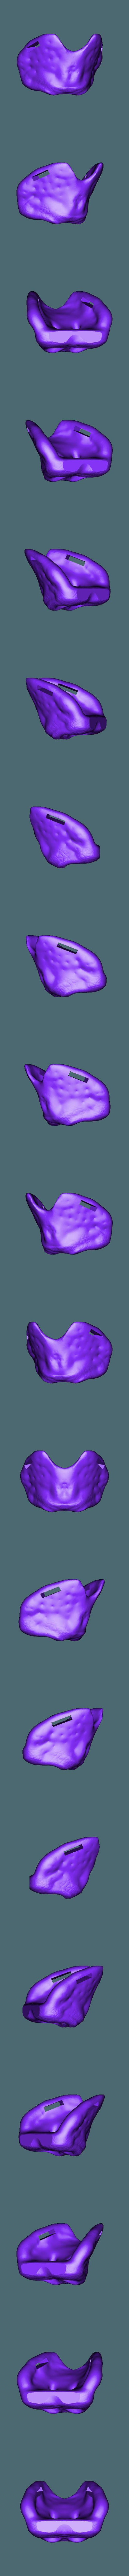 Pig Nose.stl Download free STL file Halloween Animal Nose Pack! • 3D printable object, DFB93